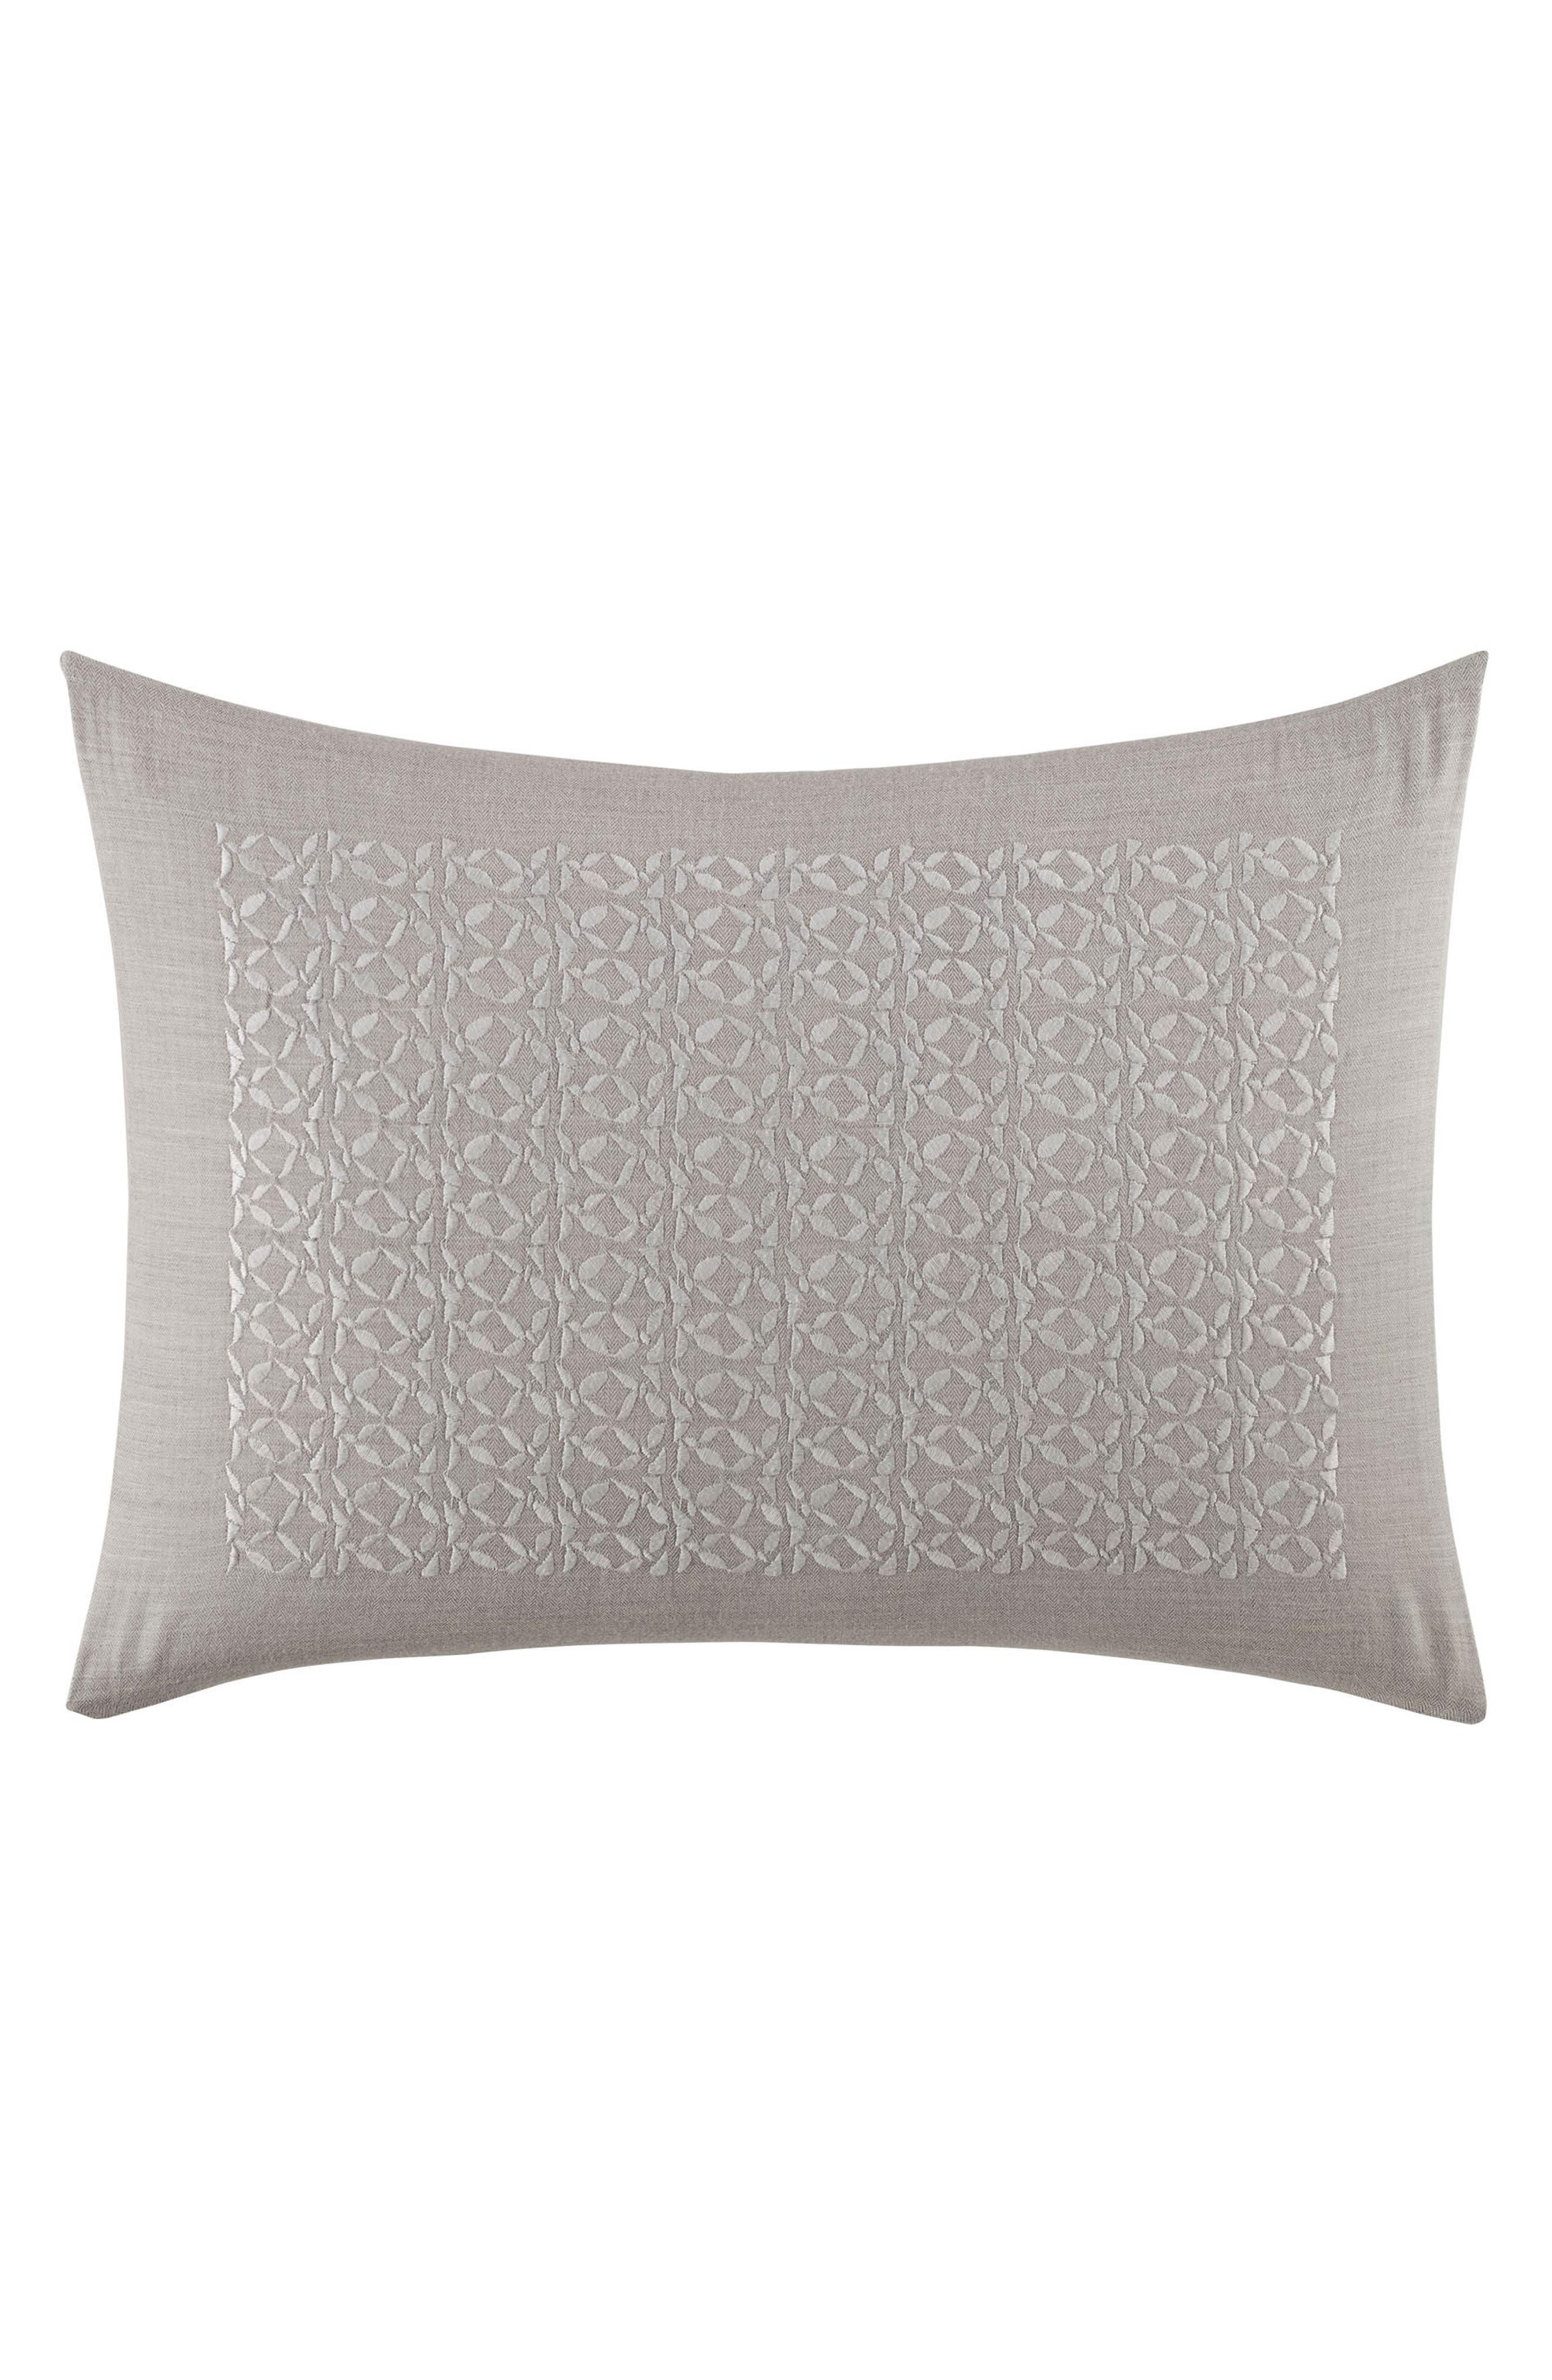 Veiled Bouquet Breakfast Accent Pillow,                             Main thumbnail 1, color,                             Light Grey